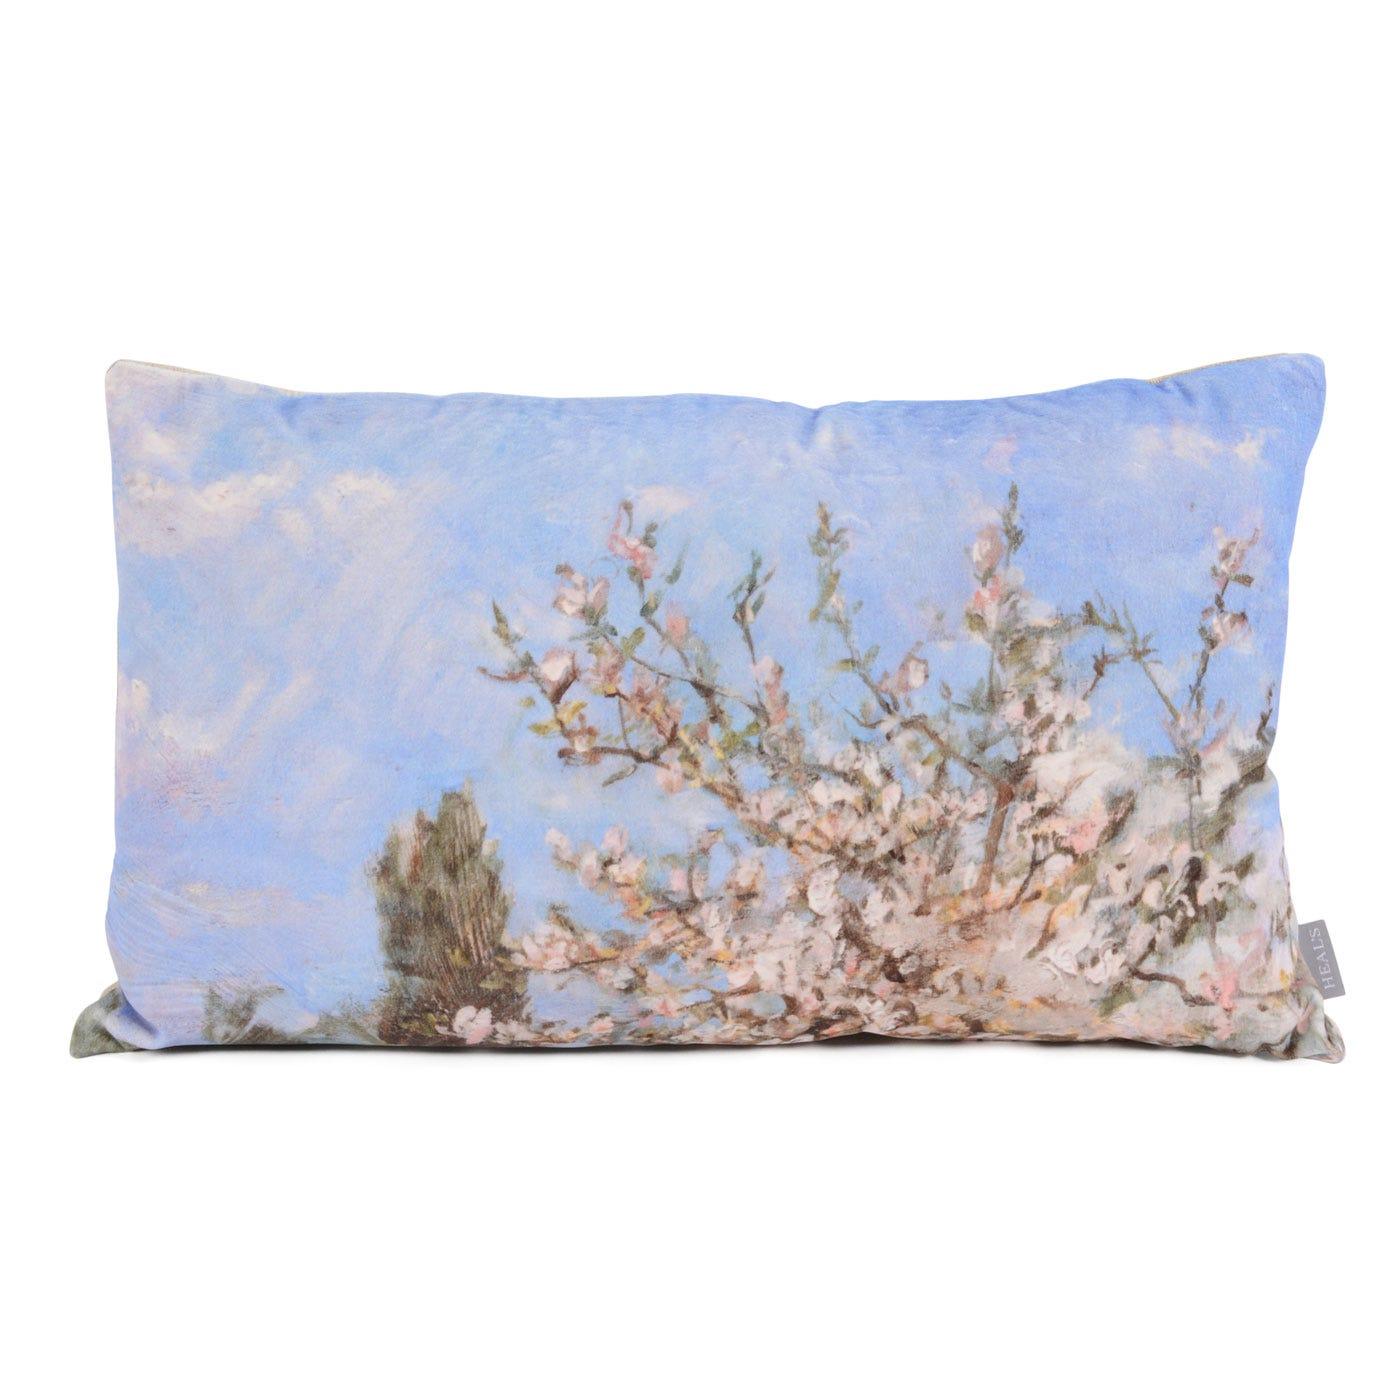 Anime Garden Cushion